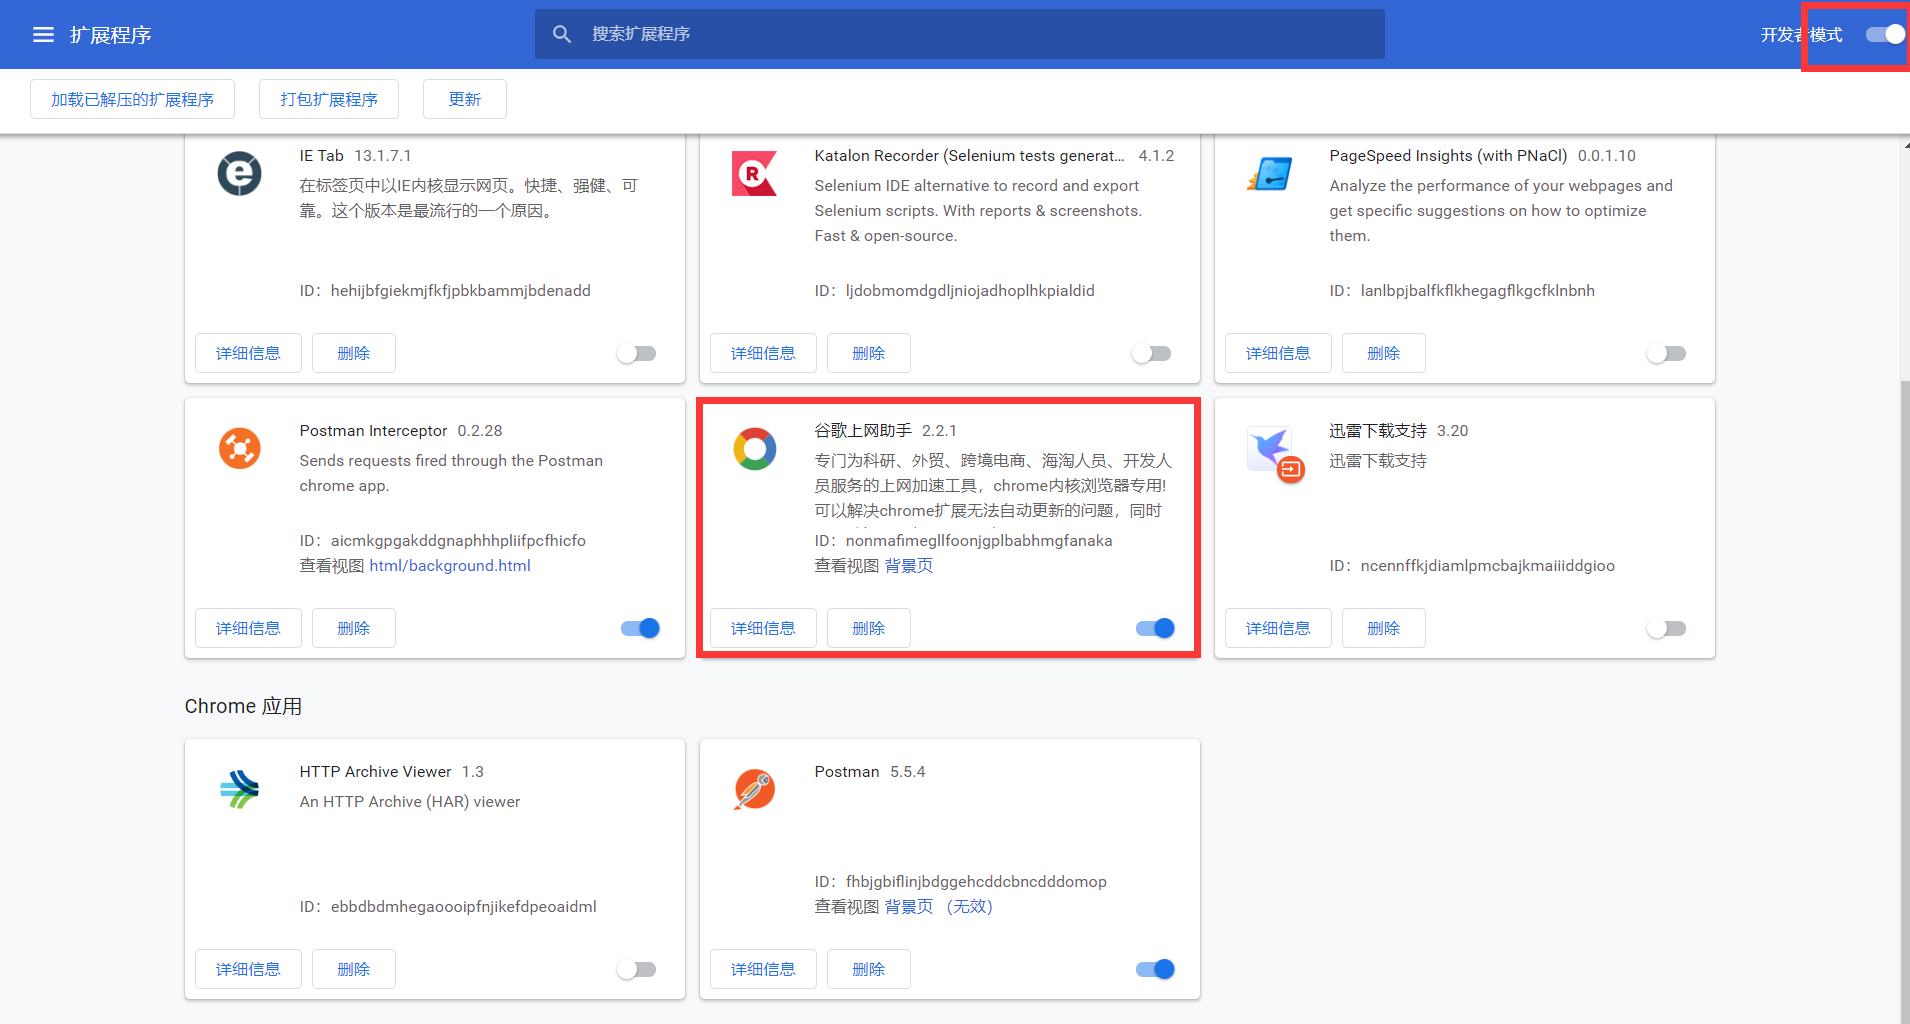 Chrome谷歌浏览器安装Ghelper – 谷歌上网助手的使用帮助